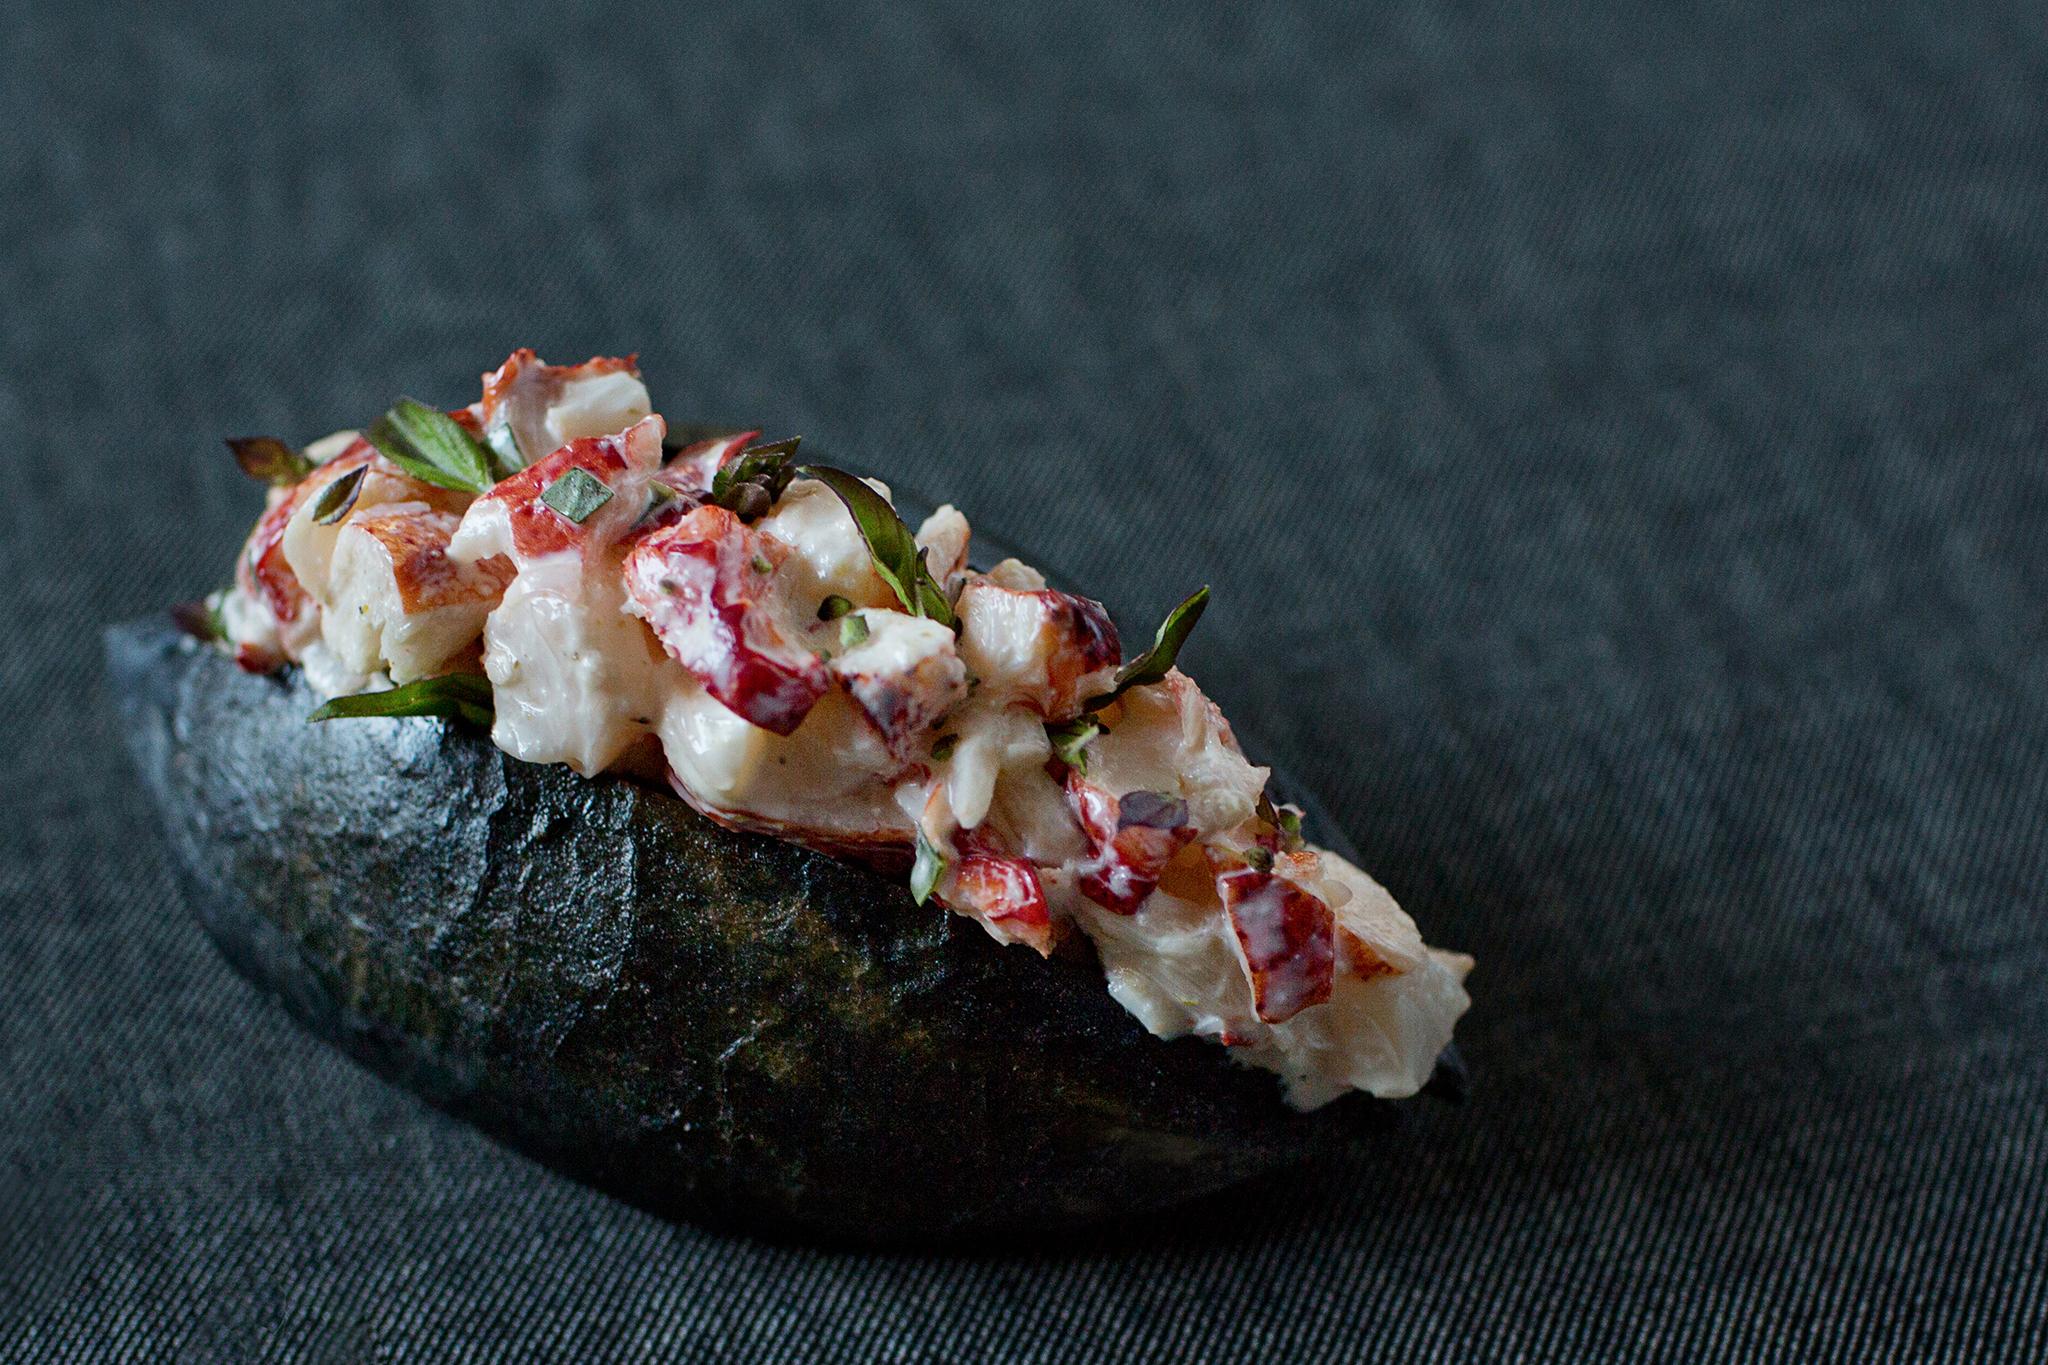 Lobster roll at Hinoki & the Bird